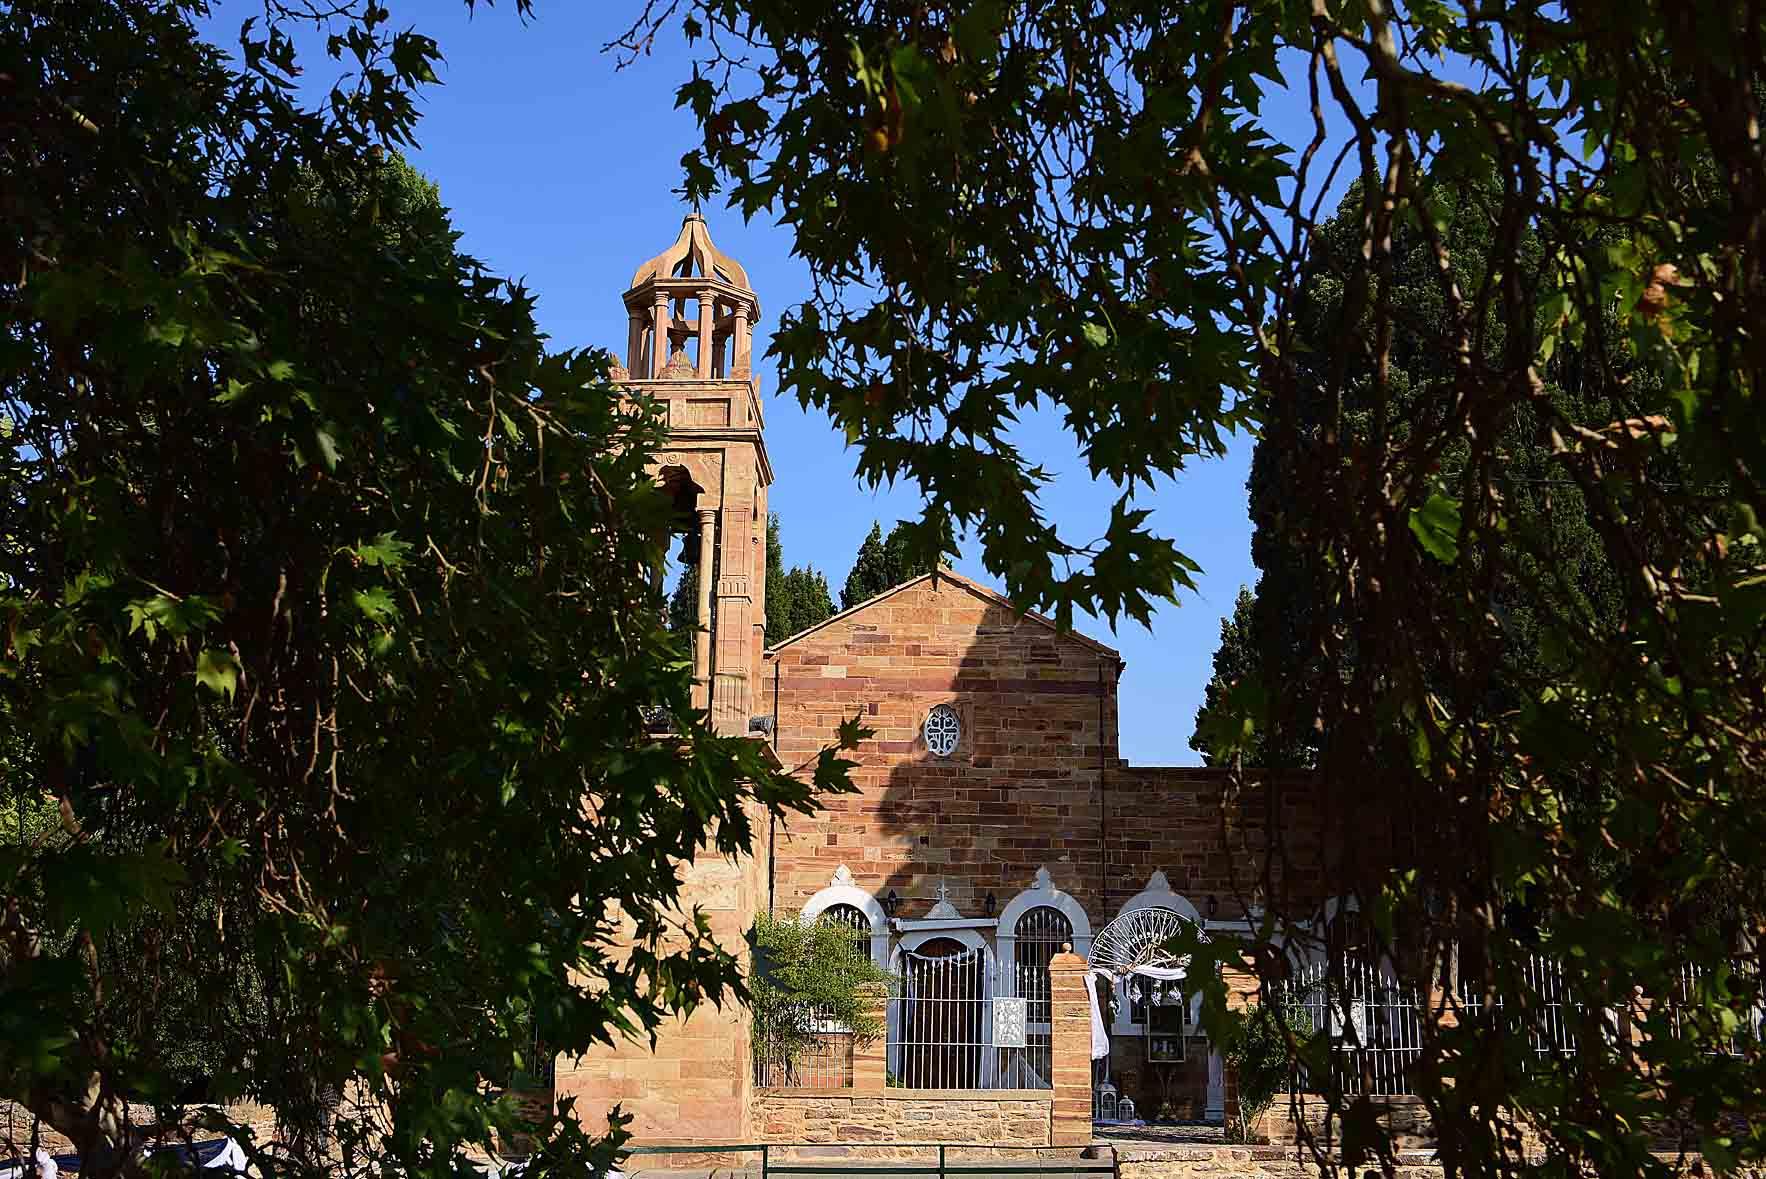 panagia-siriotissa-kampos-chios-christening-baptism-alexis-koumaditis-photography-03